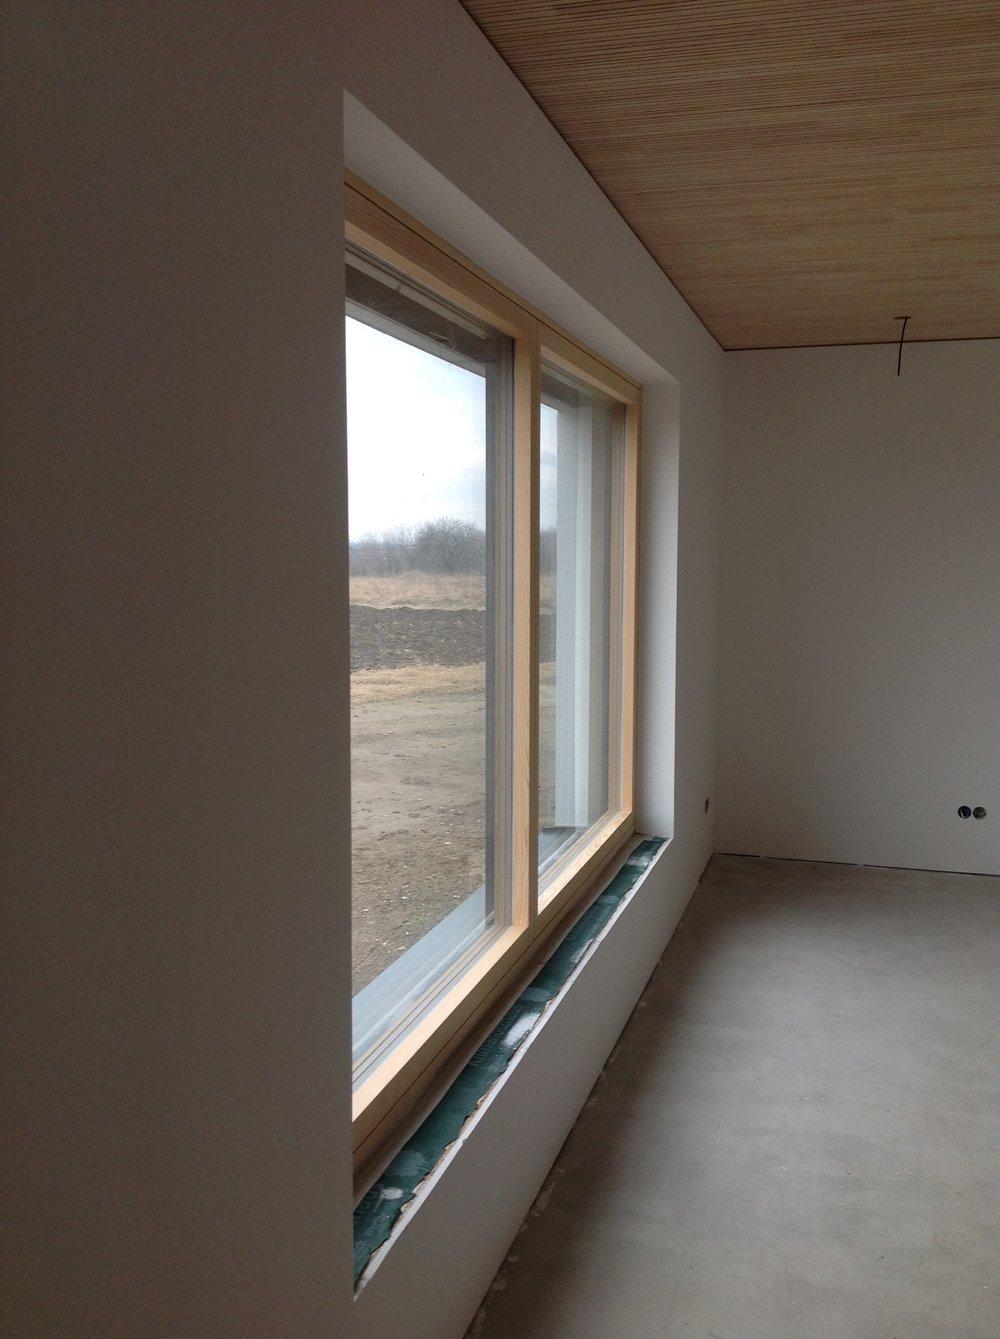 passive-houses-in-slovakia-30.jpg